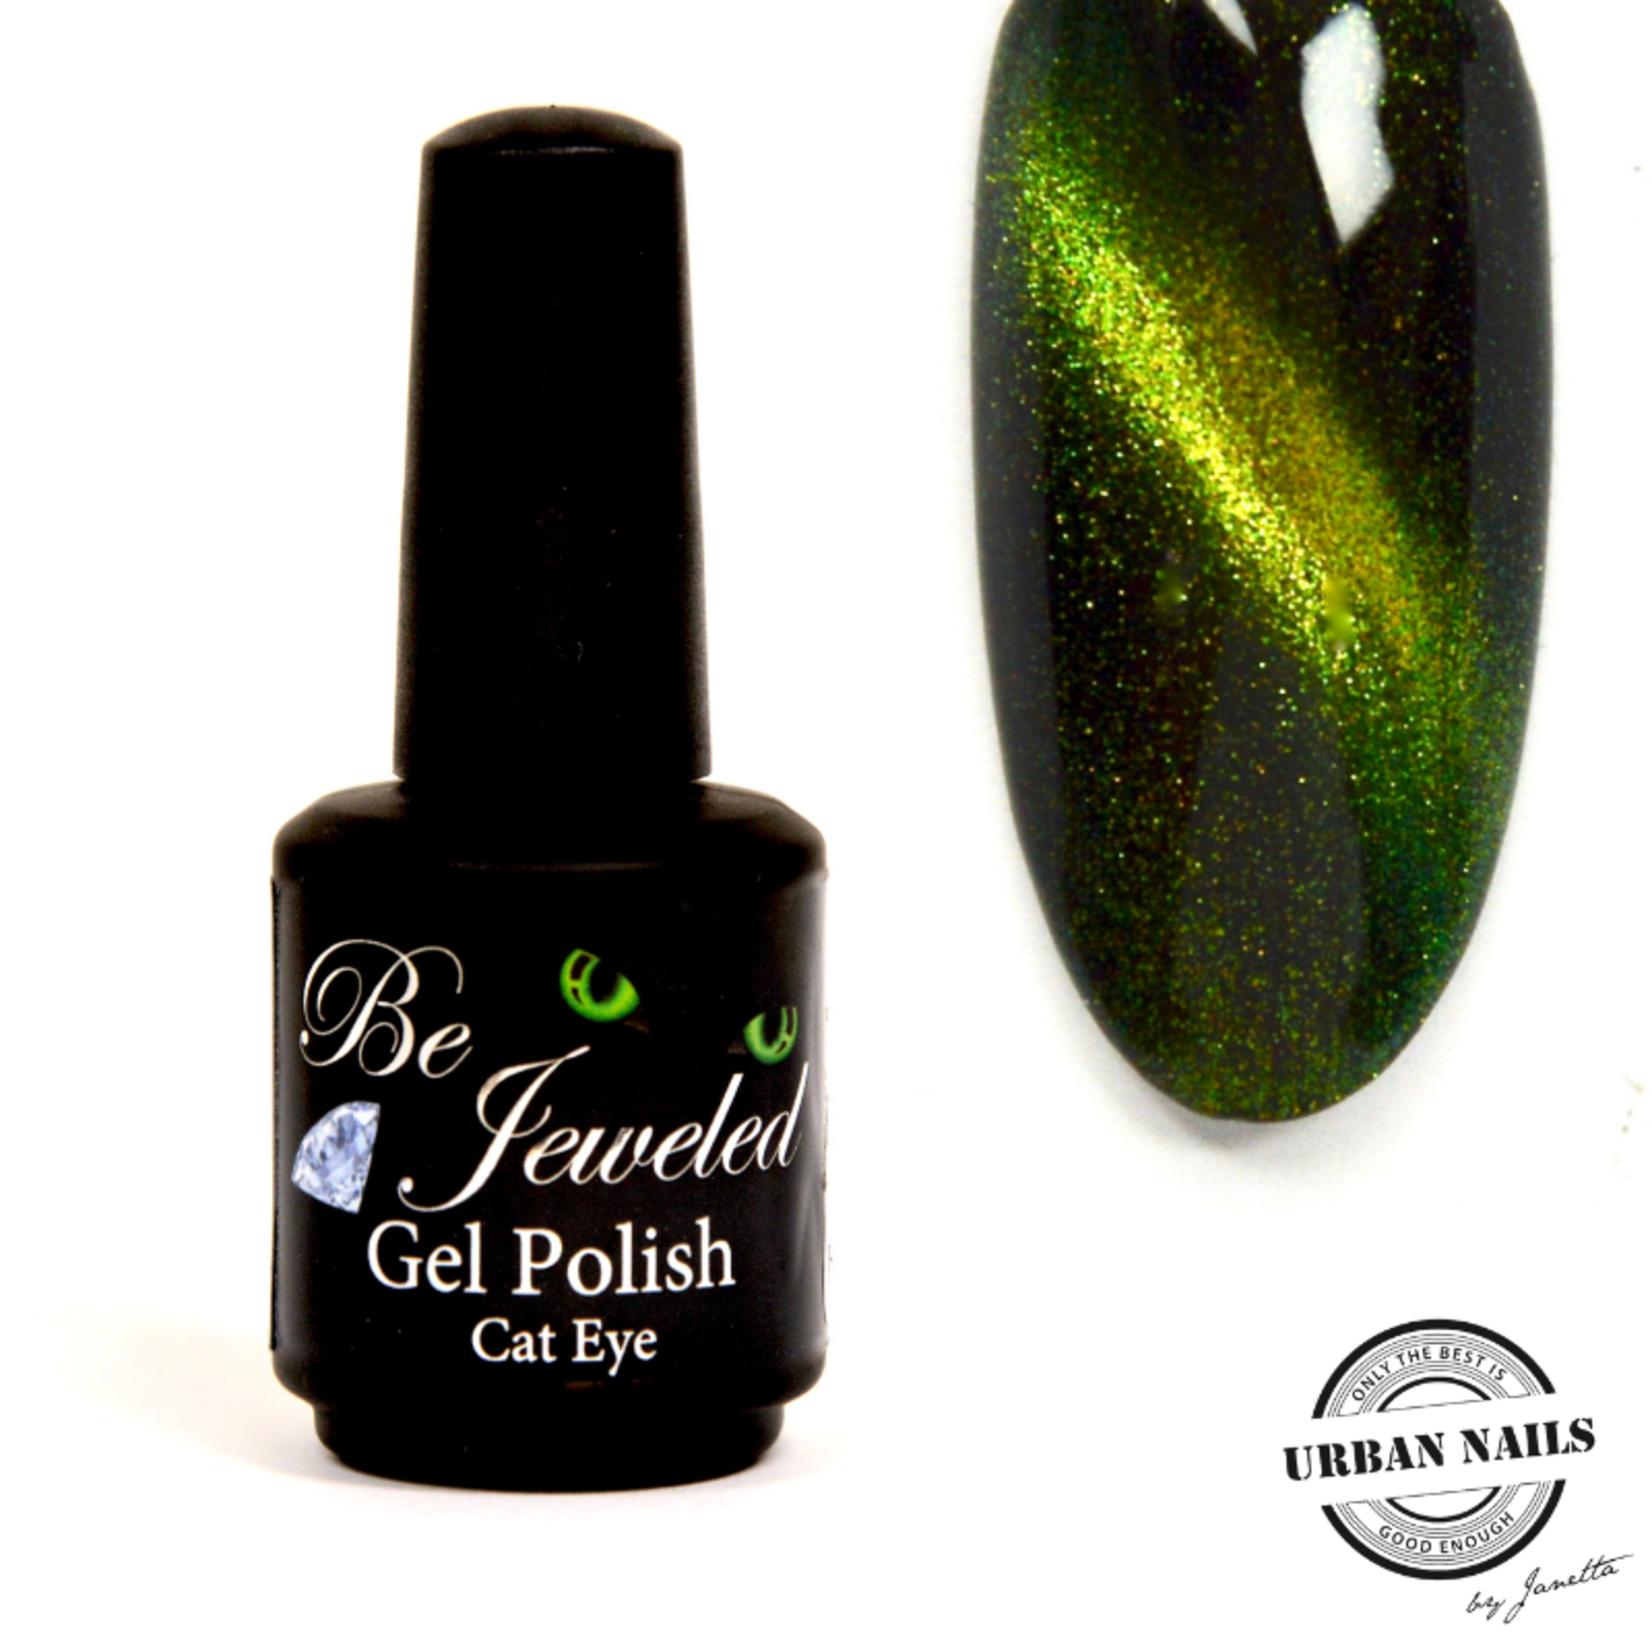 Urban Nails Be Jeweled Cateye 56 (Chameleon) Geel Groen